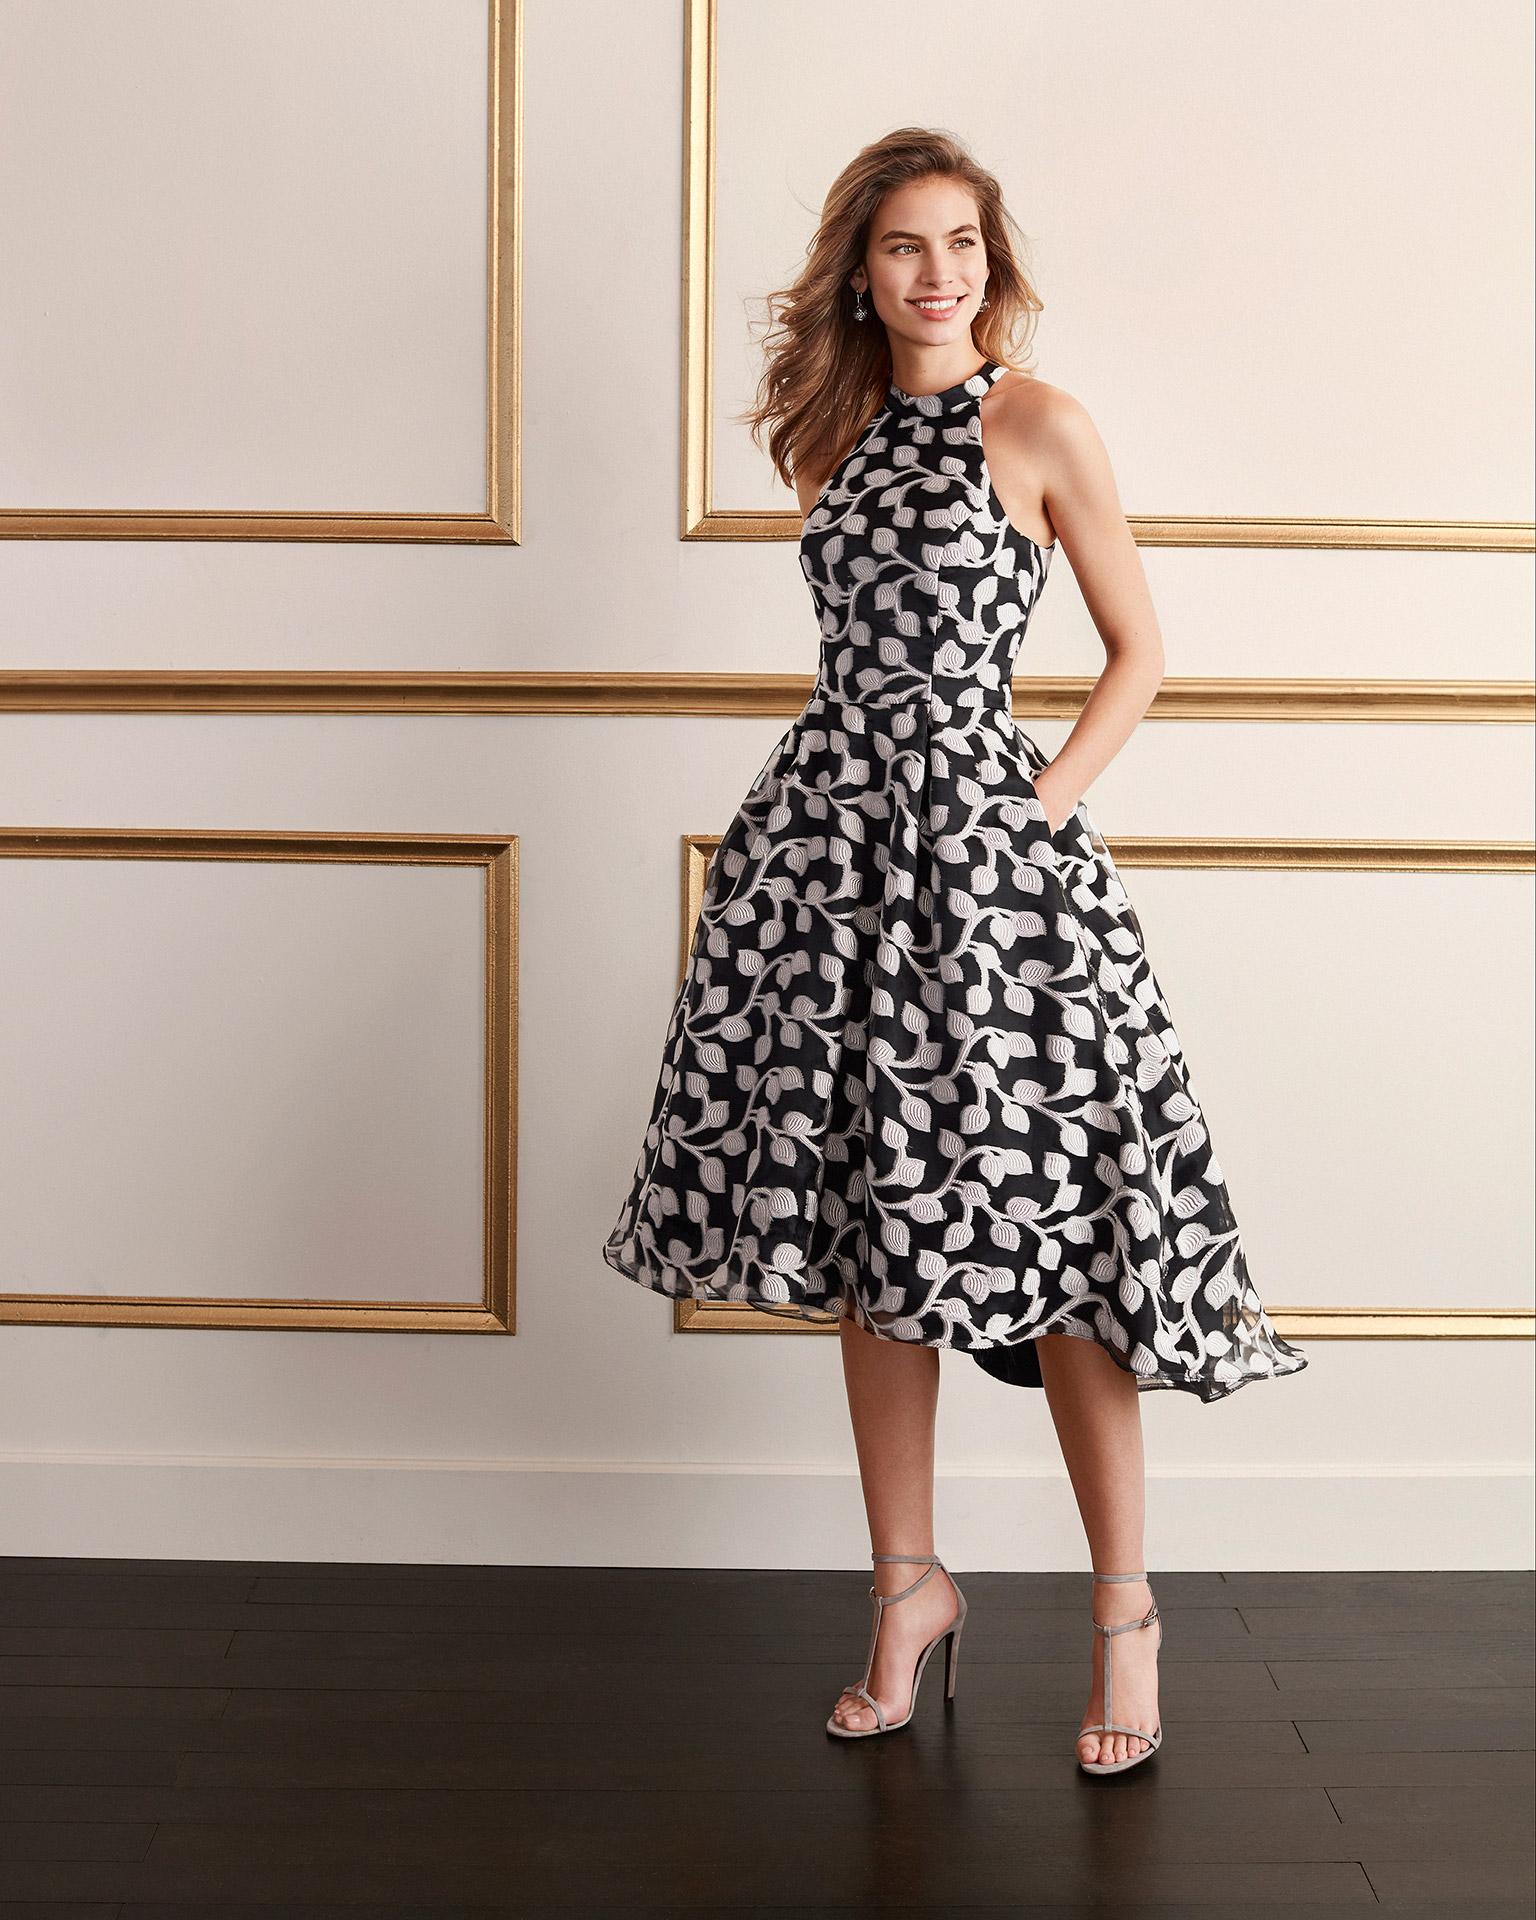 Short brocade cocktail dress. Halter neckline with asymmetrical skirt. 2020 MARFIL BARCELONA Collection.